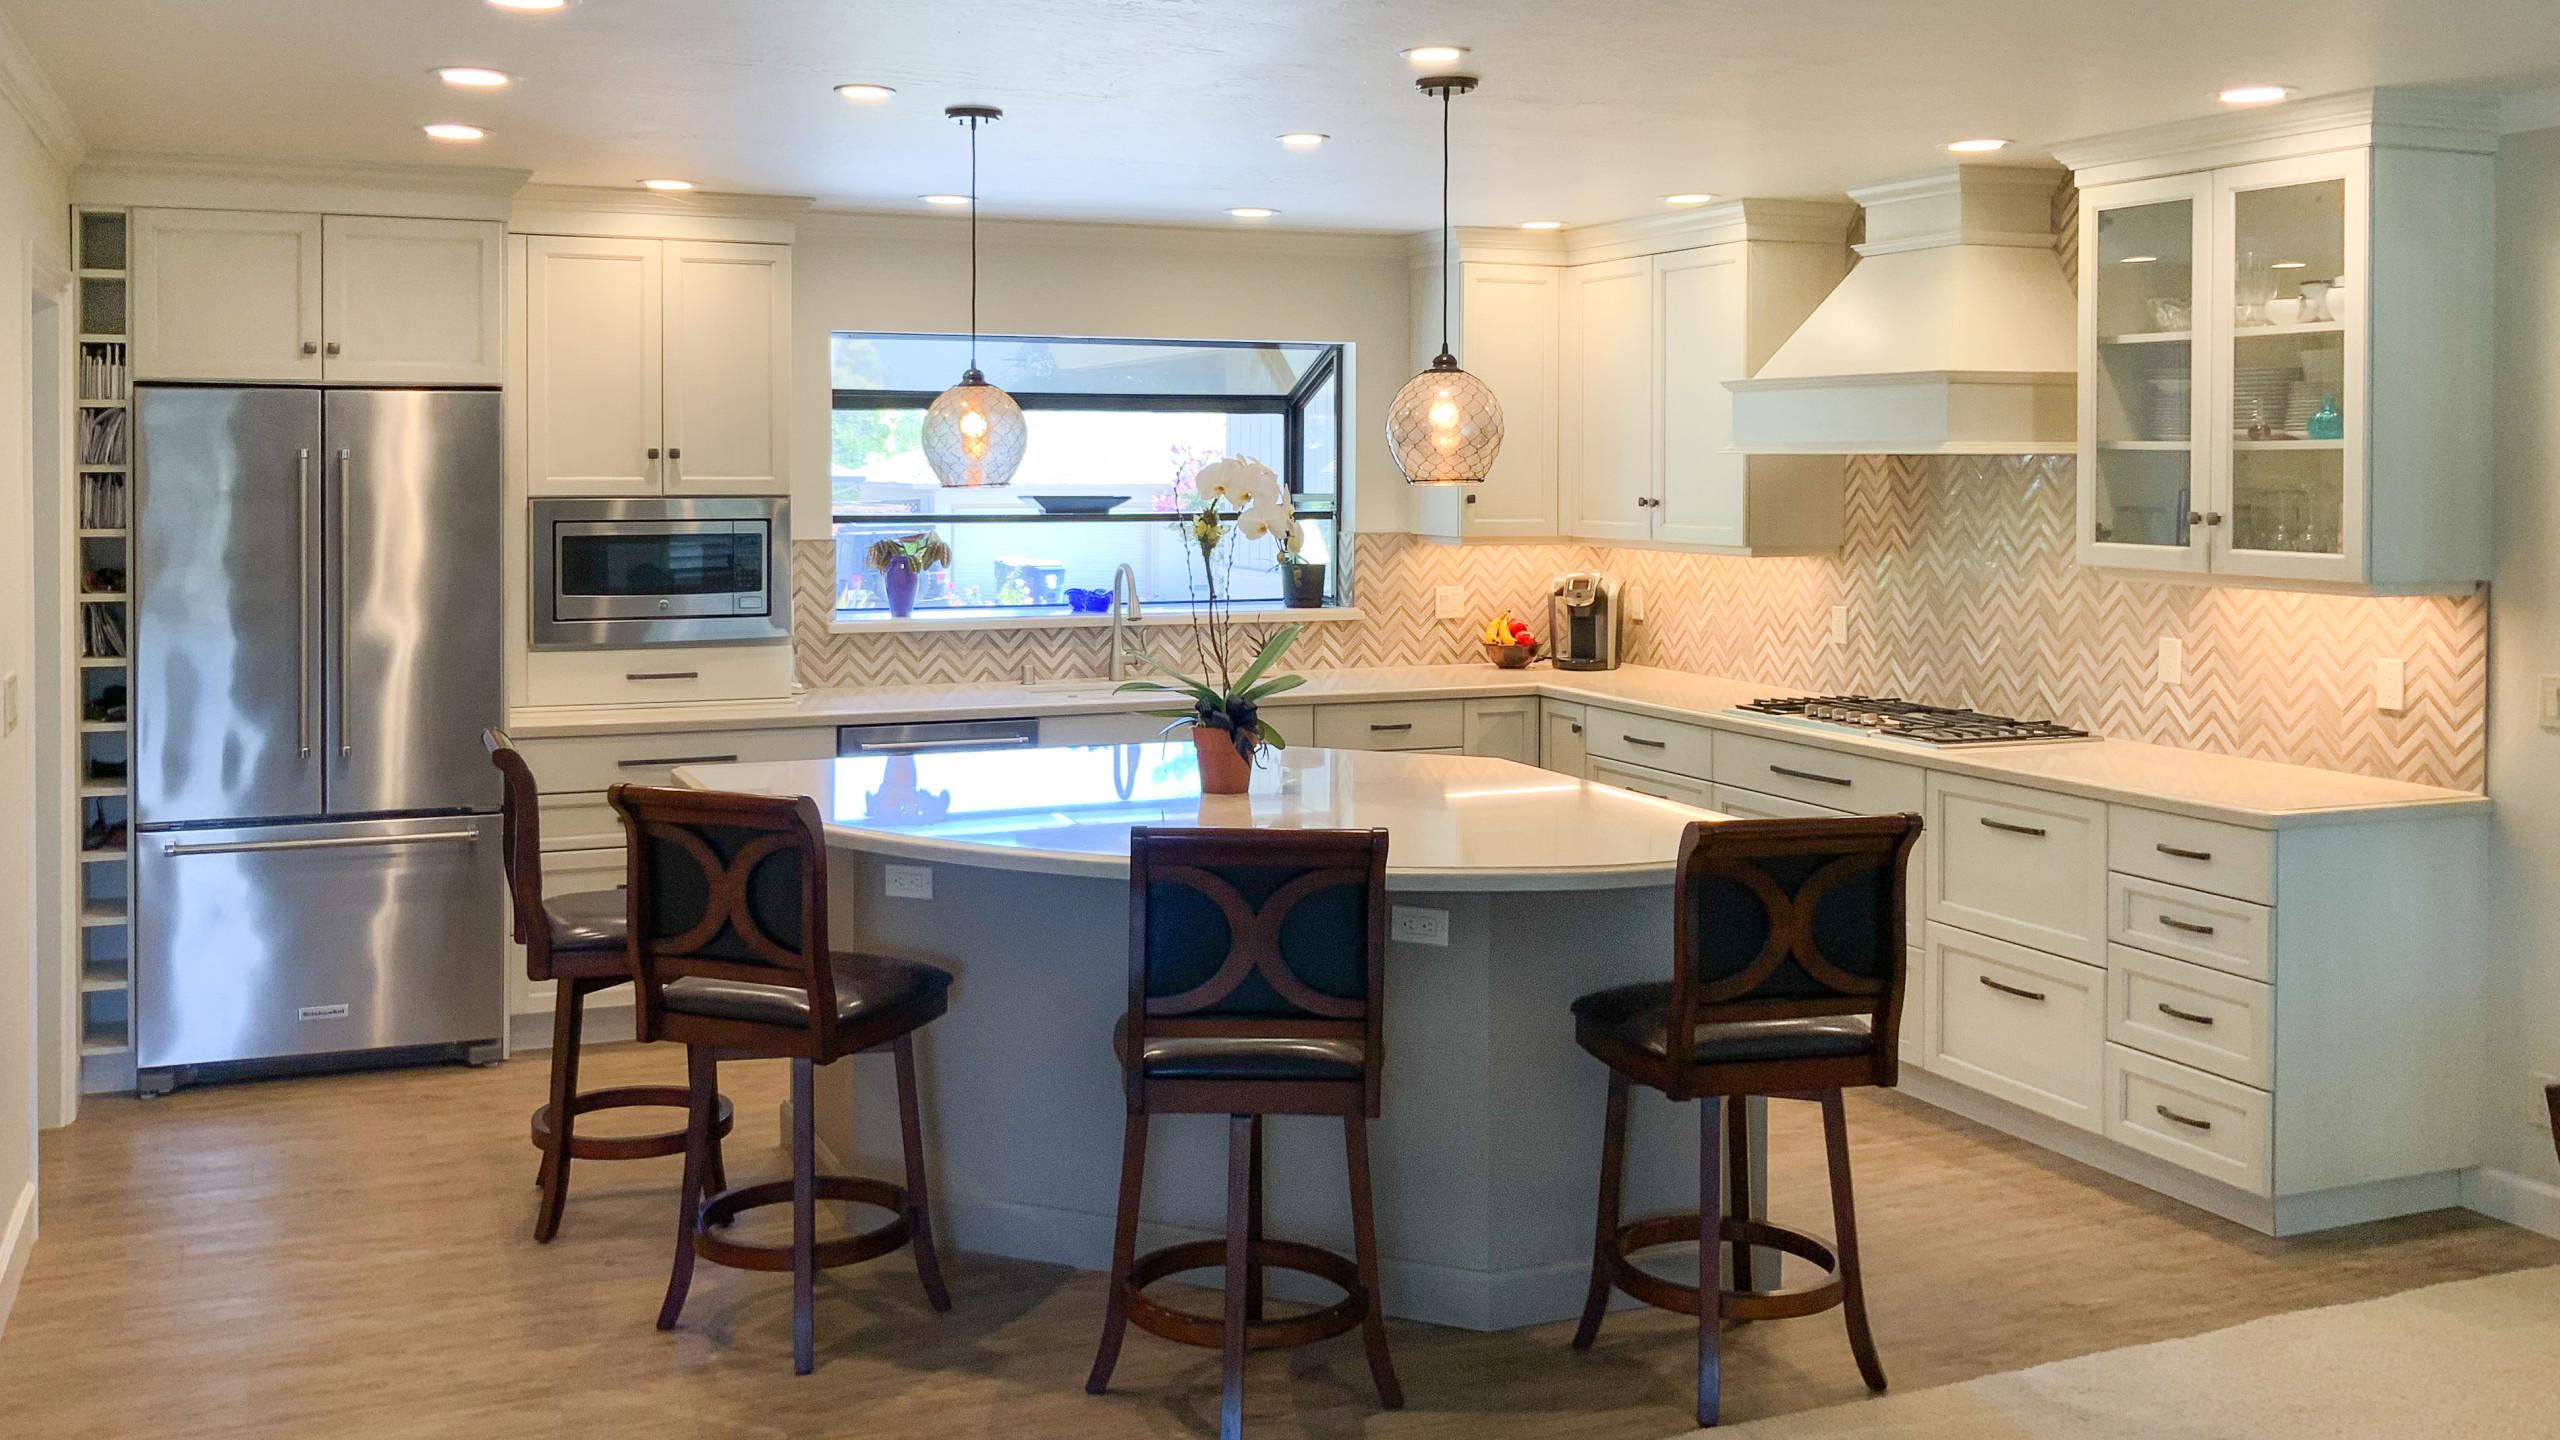 Kitchen with Unique Island